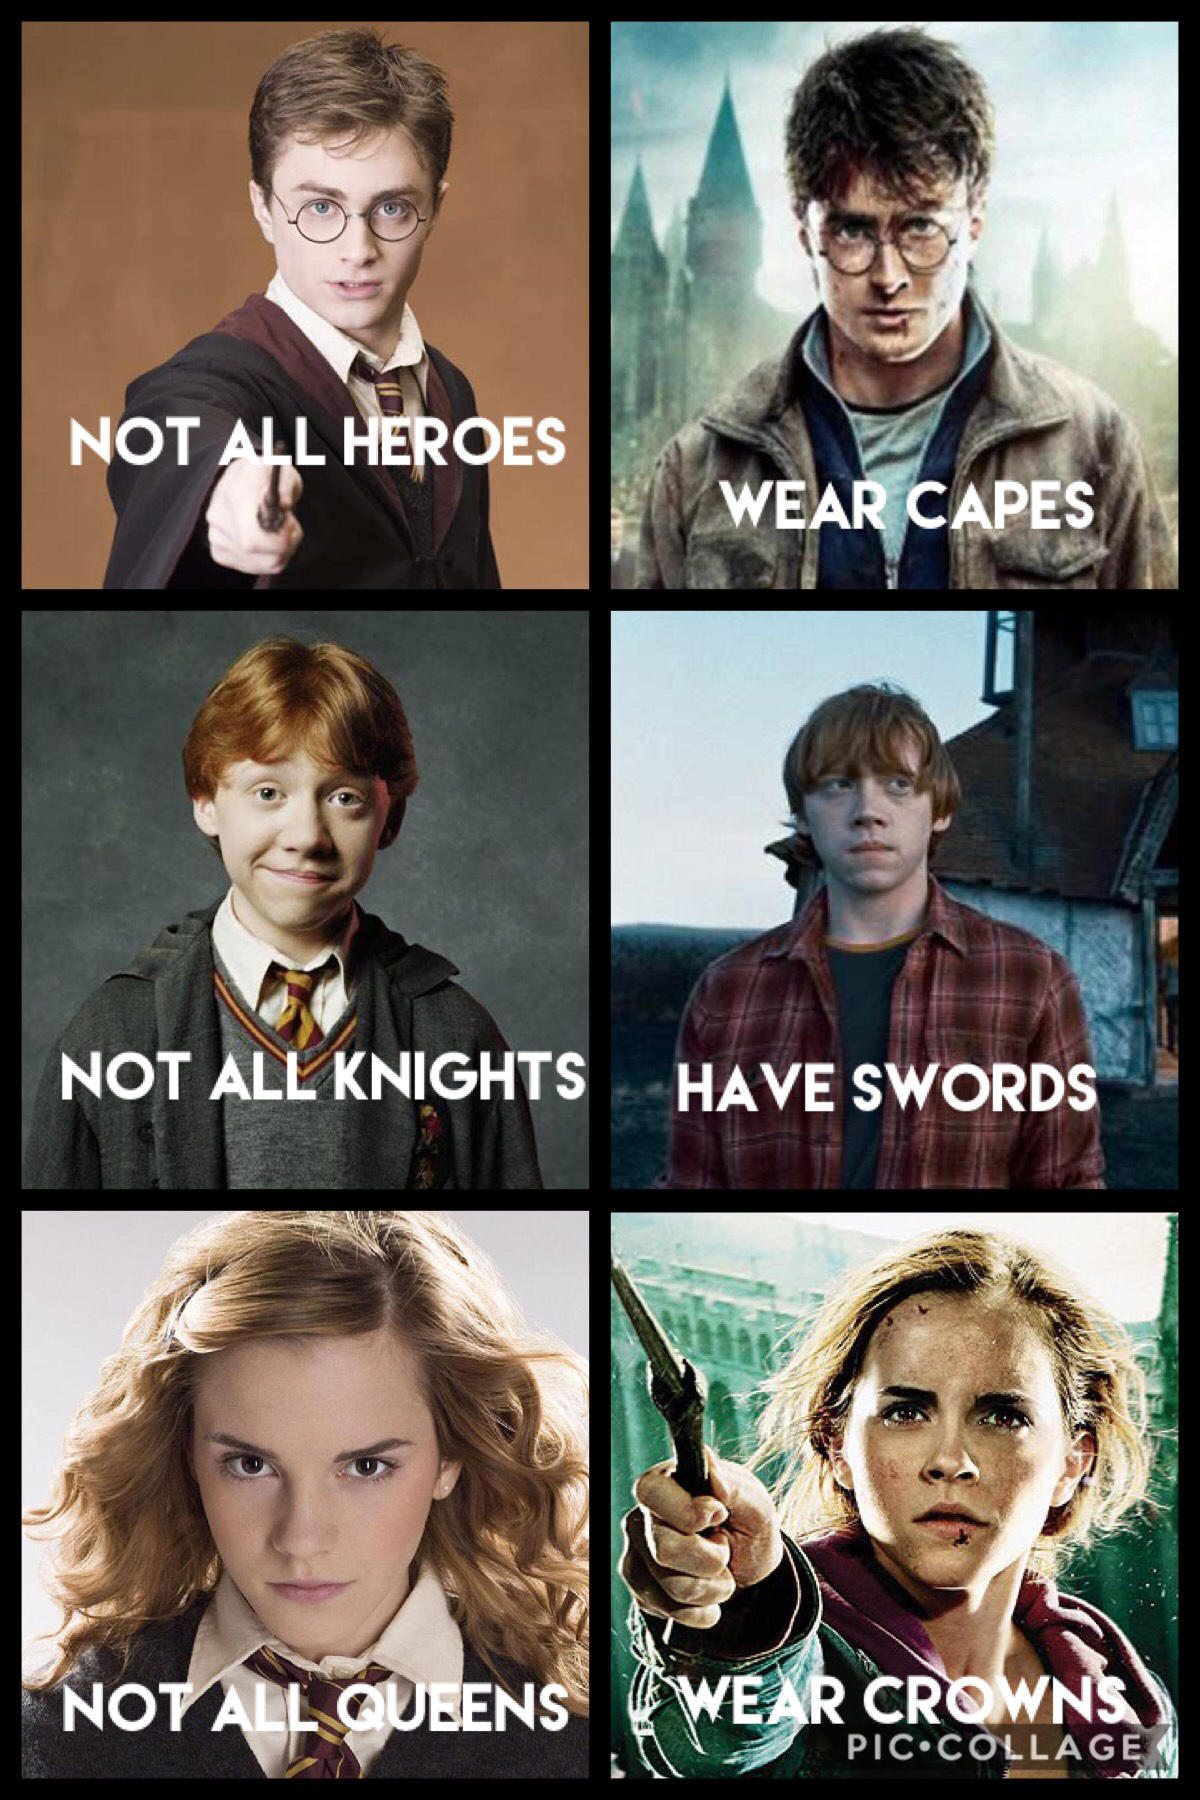 Preach Harry Potter Universal Harry Potter Film Harry Potter World